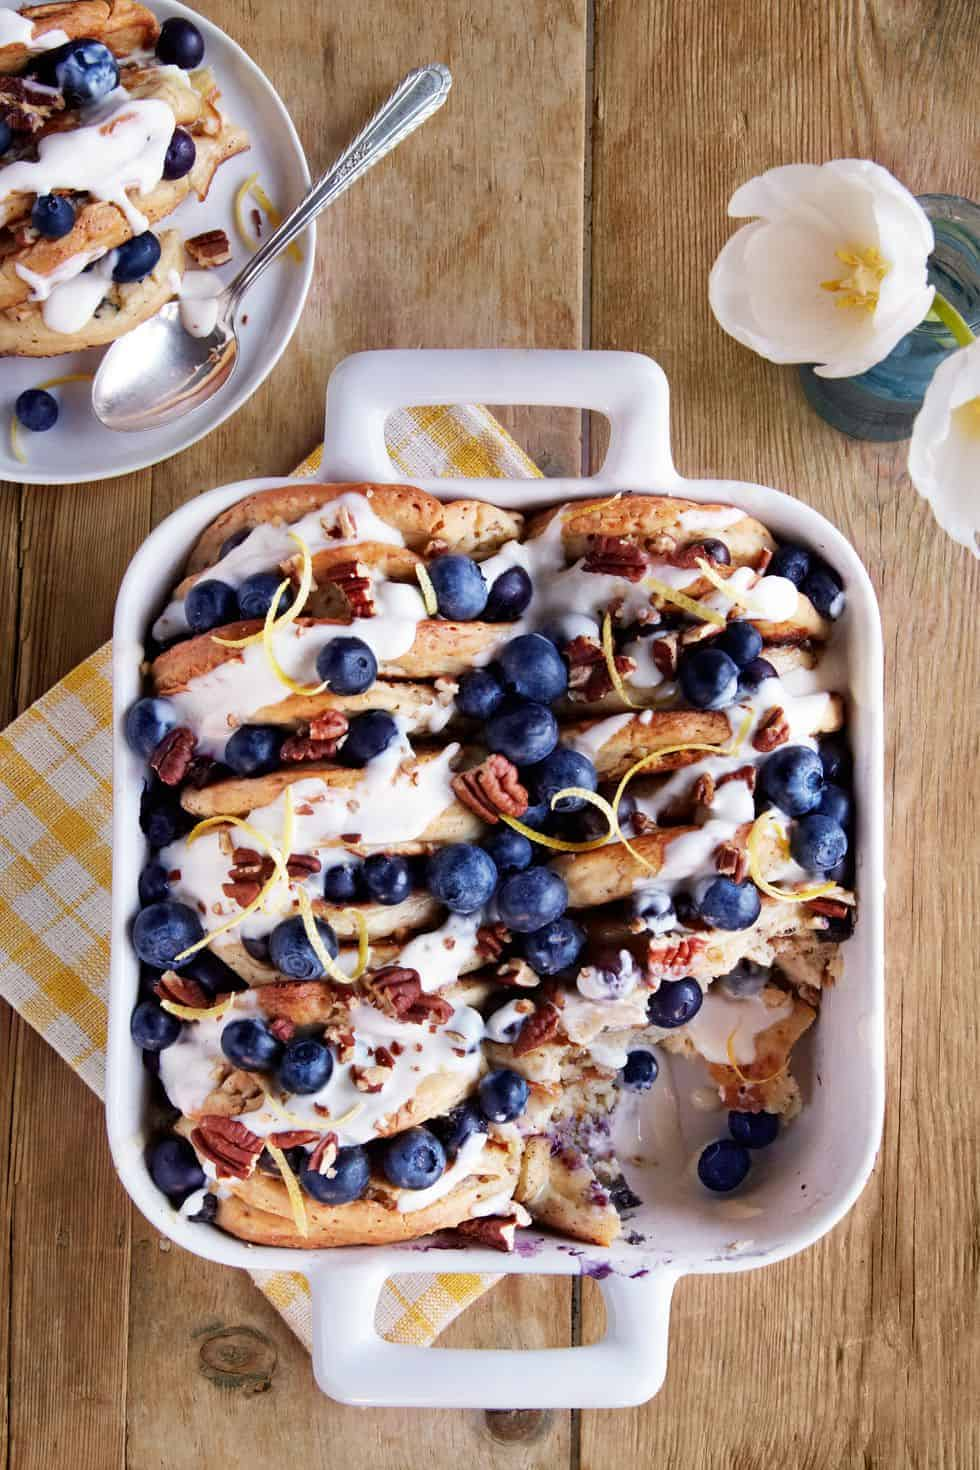 Breakfast casseroles kids will love. Blueberry pecan pancake bread pudding